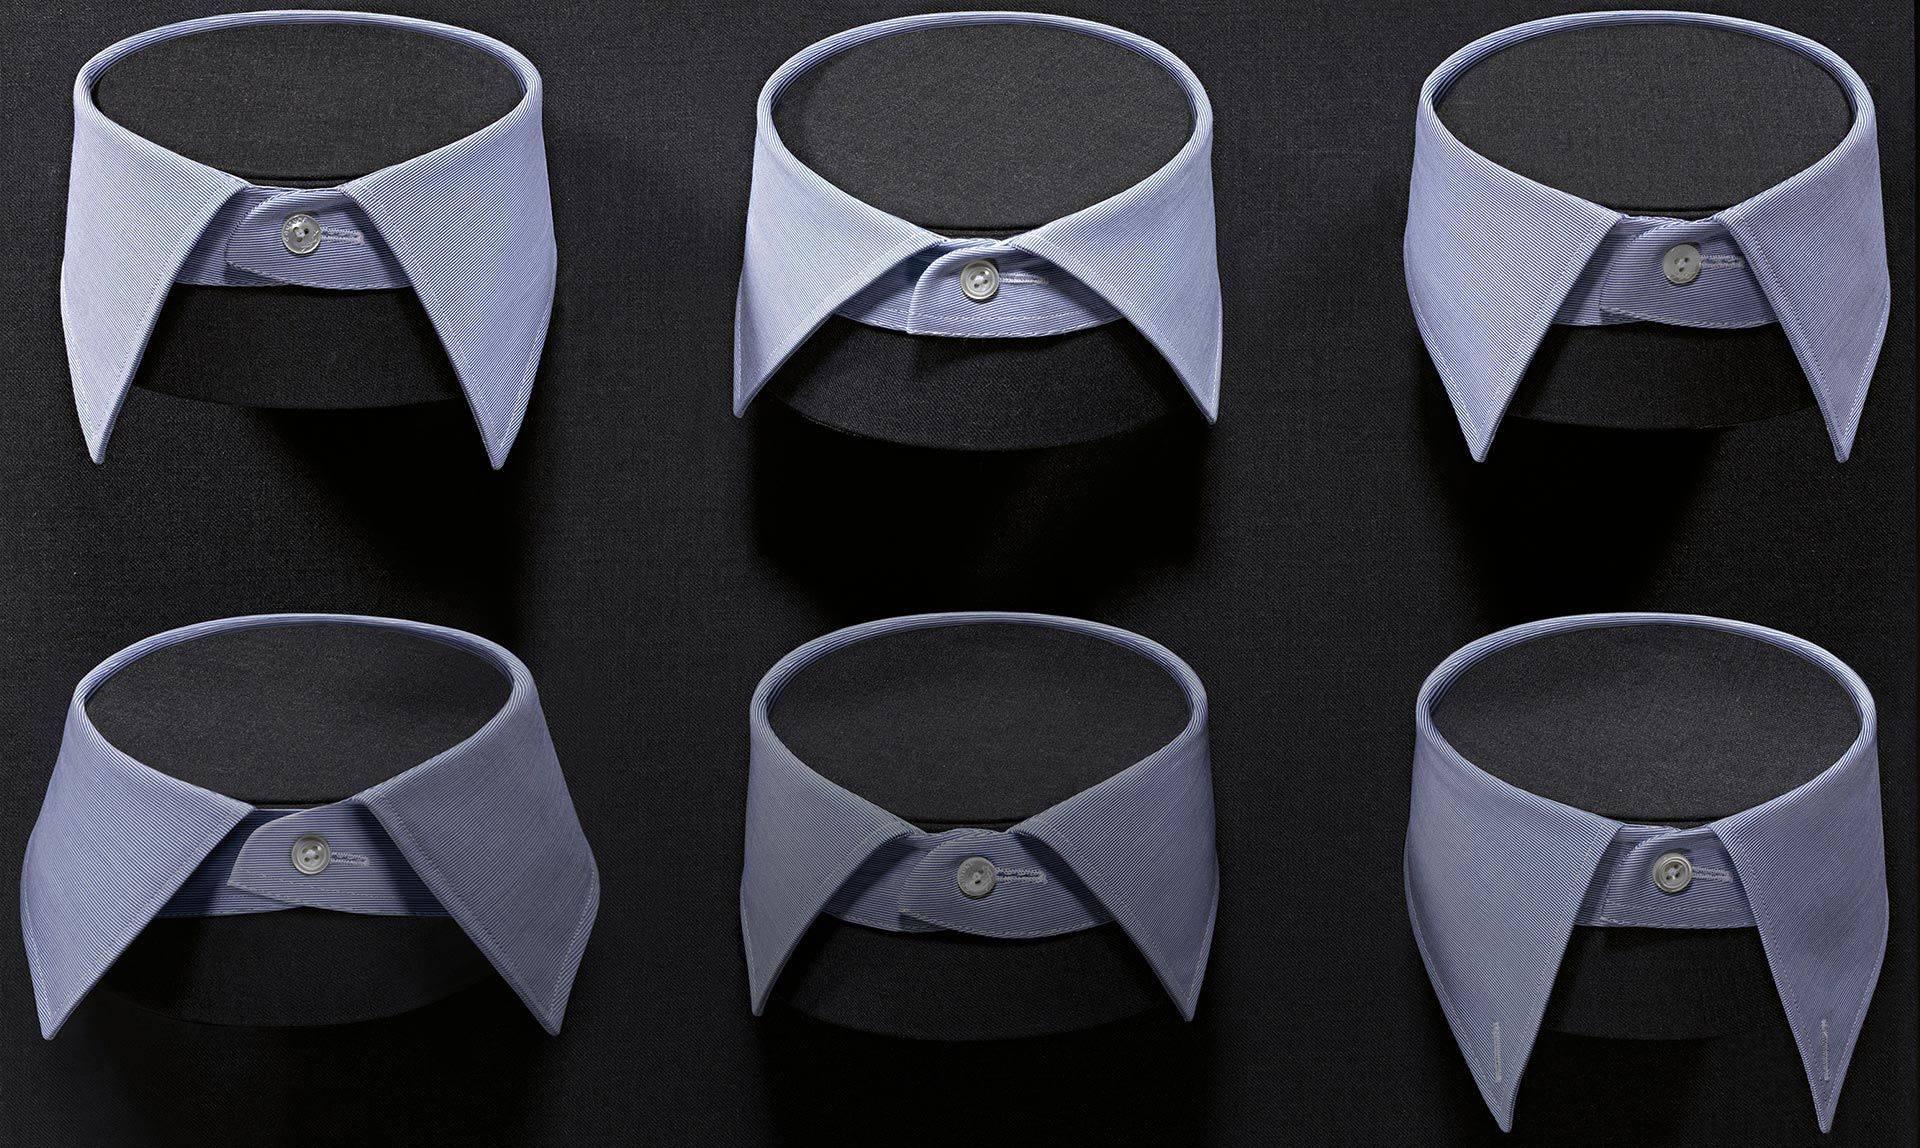 Custom collars